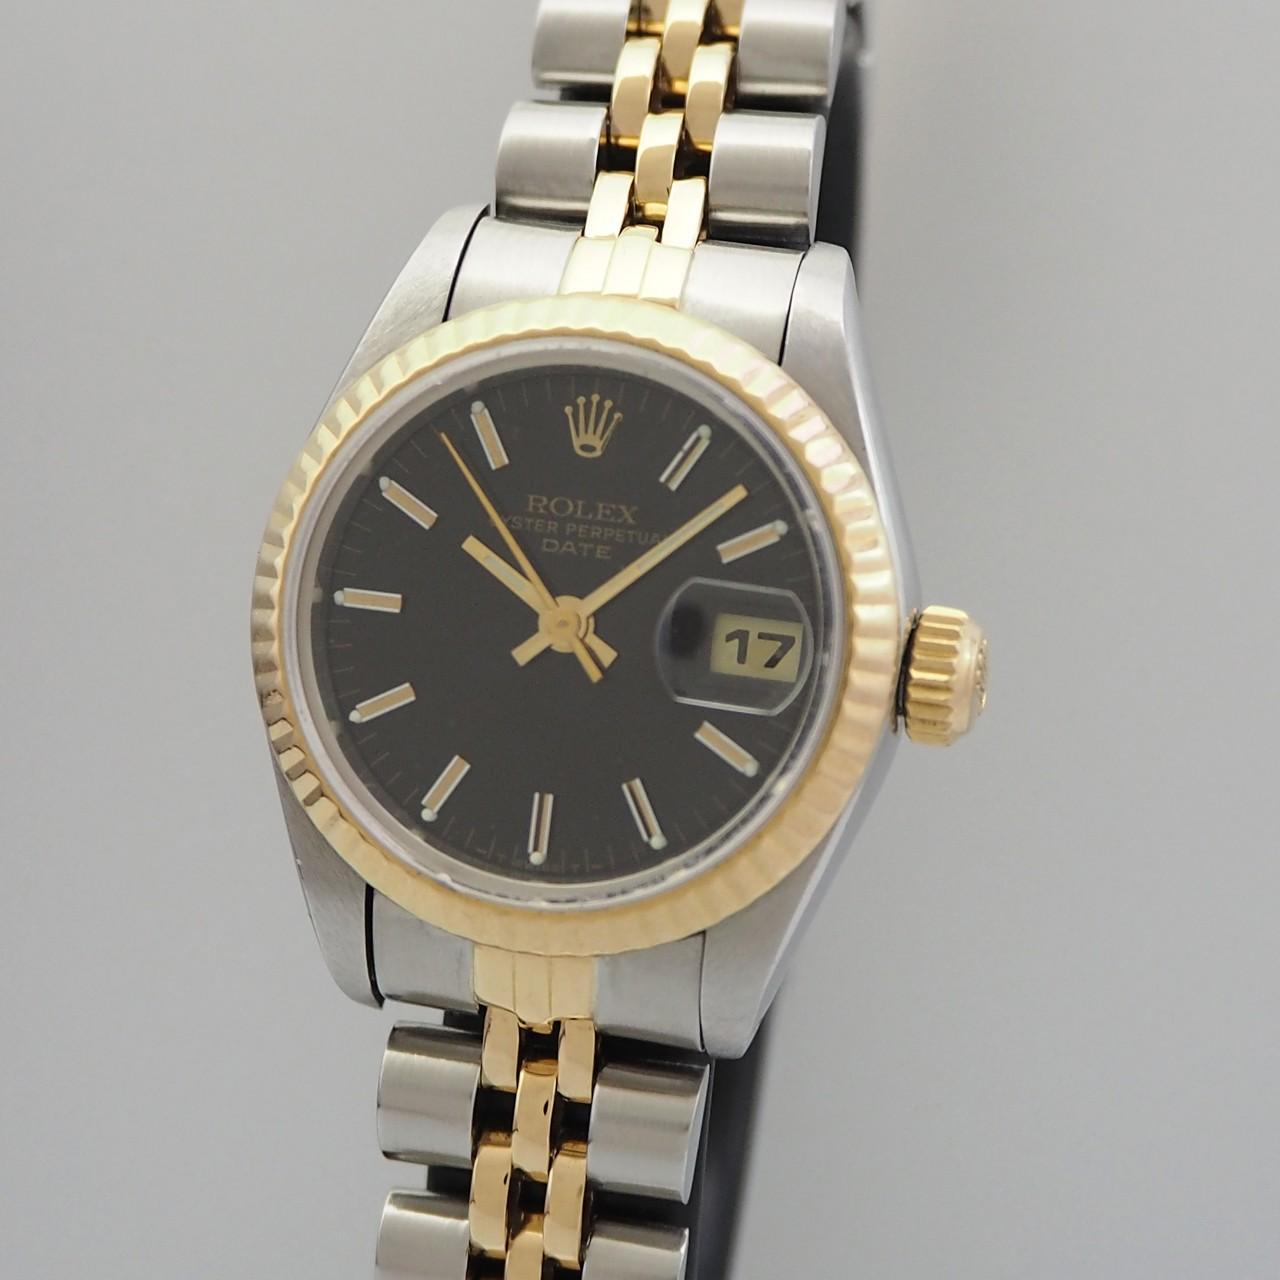 Rolex Oyster Perpetual Lady 6917 Stahl/Gold Saphir, Rolex Box 1985